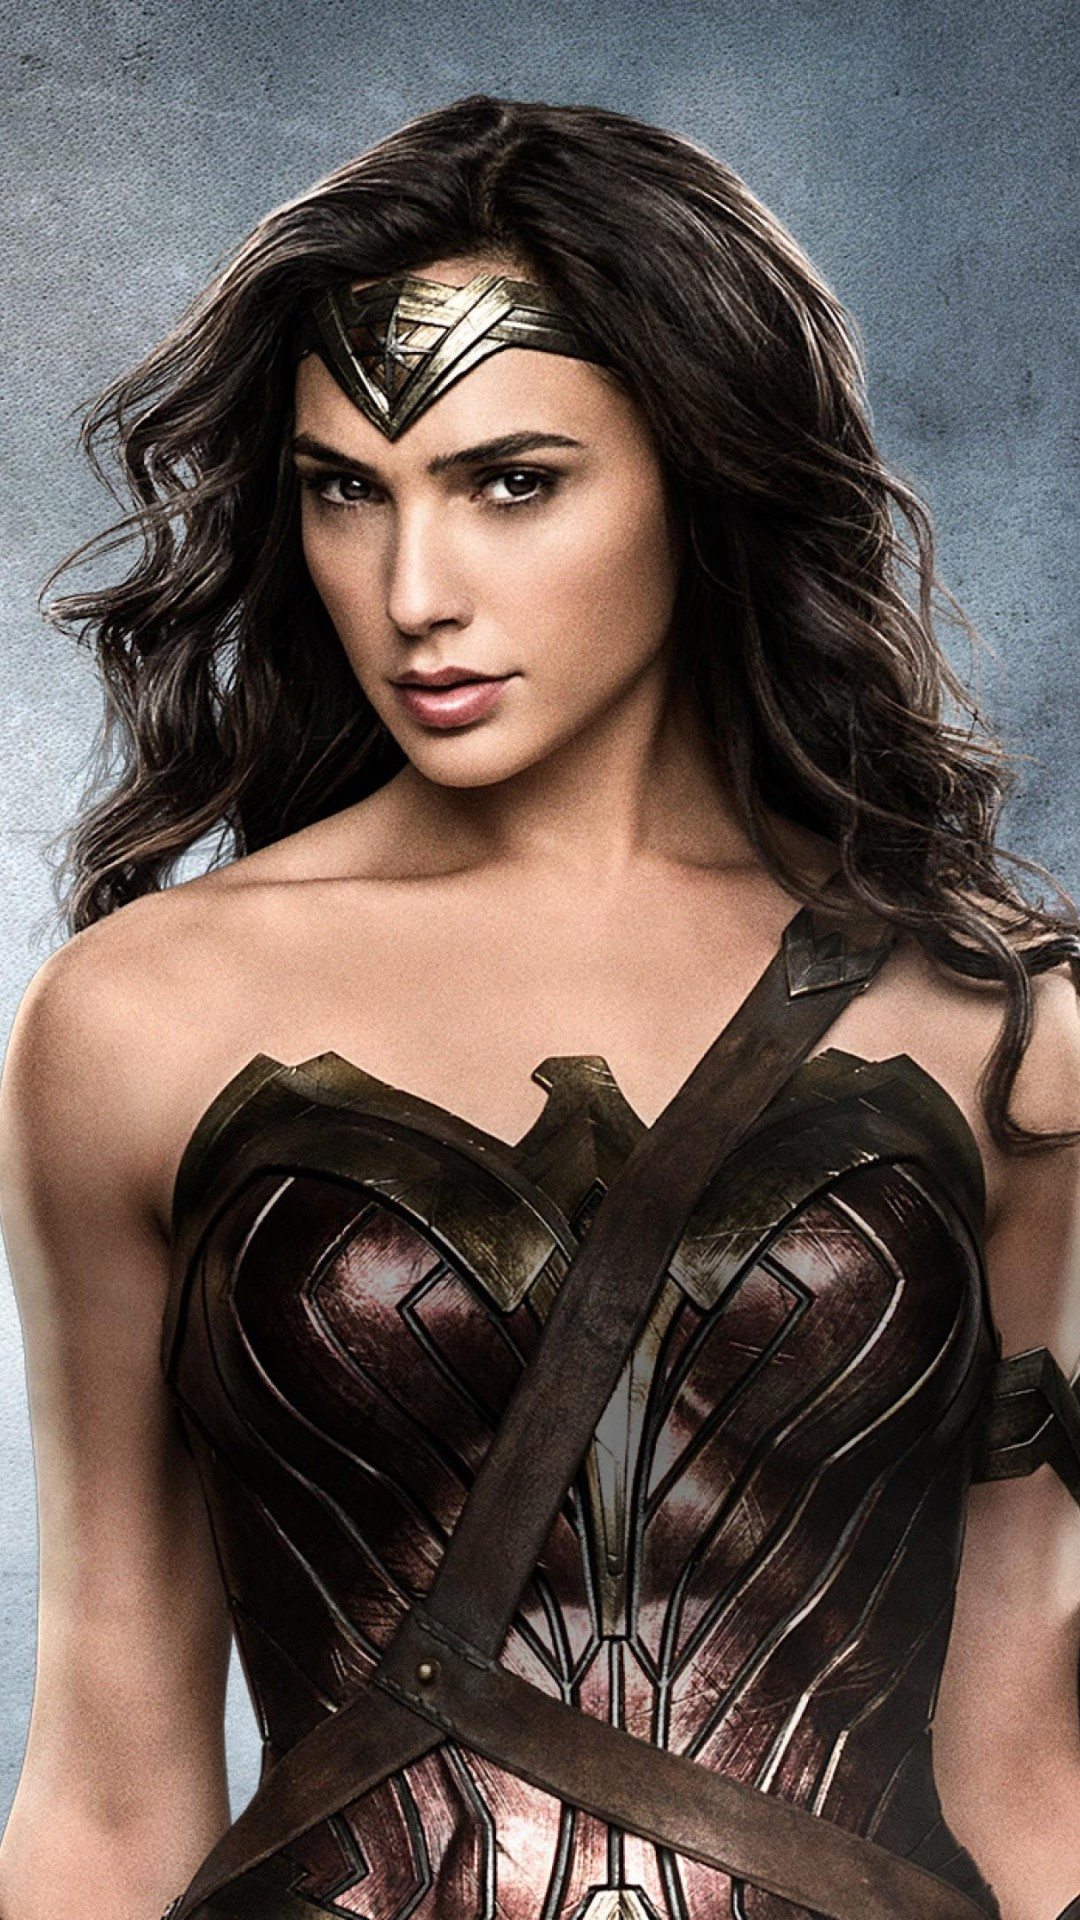 Wallpaper Wonder Woman Gal Gadot 4k Movies 14196